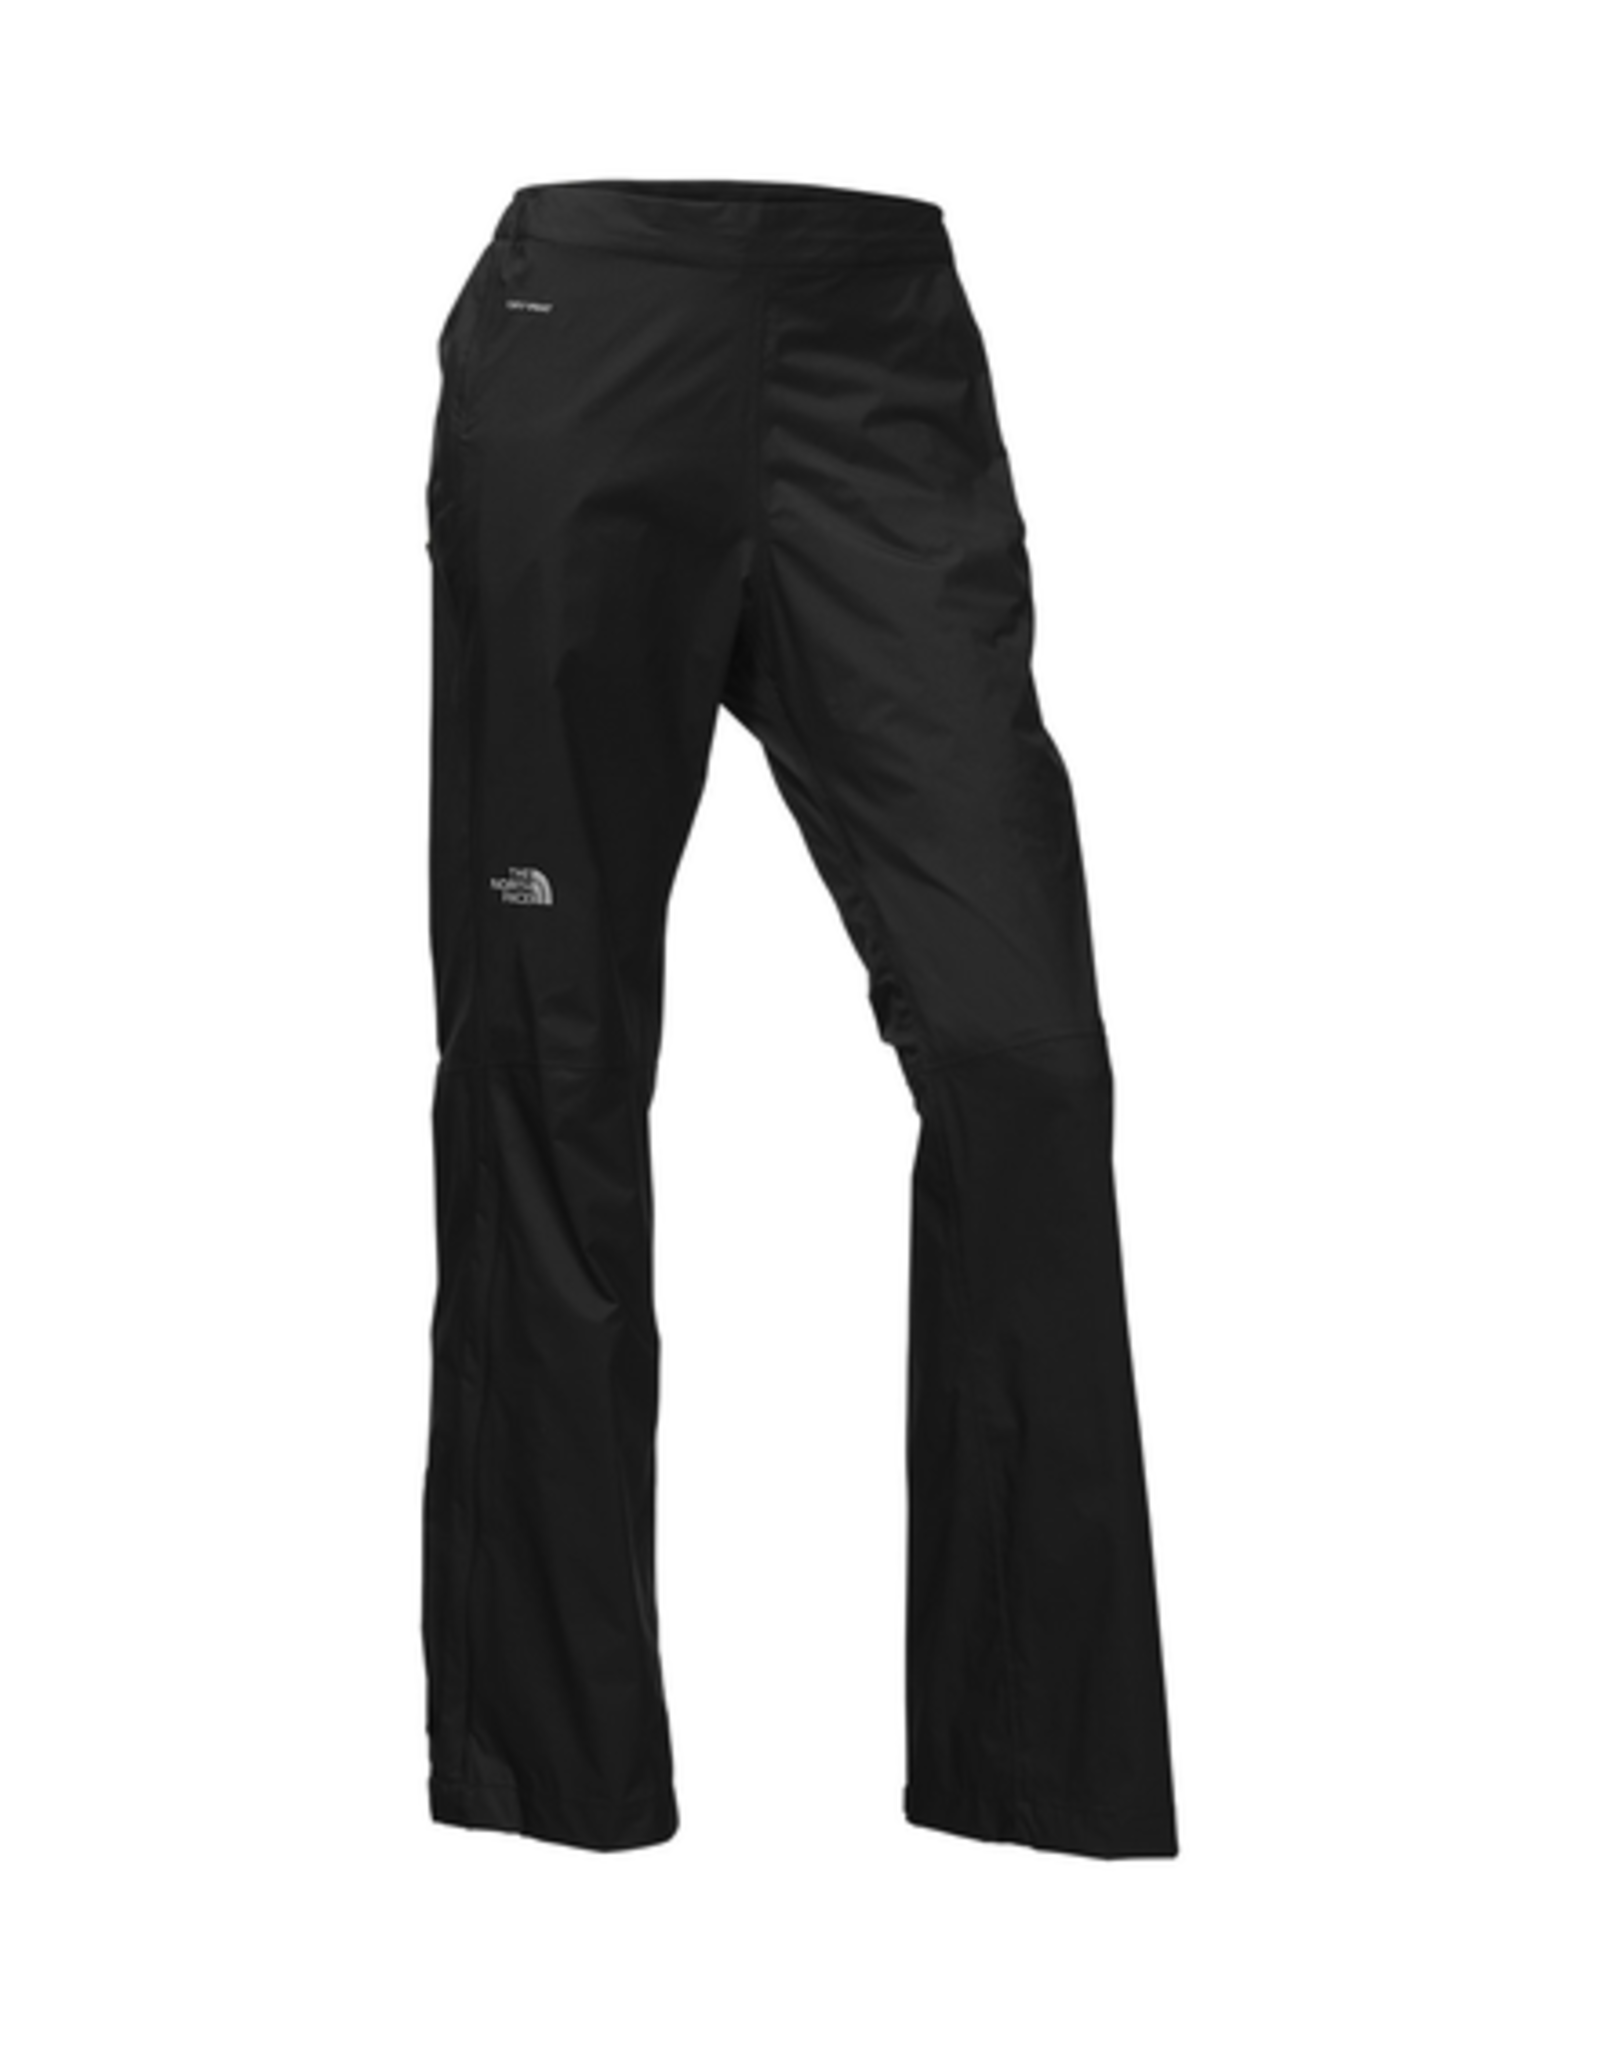 North Face North Face Women's Venture 2 Half Zip Pants